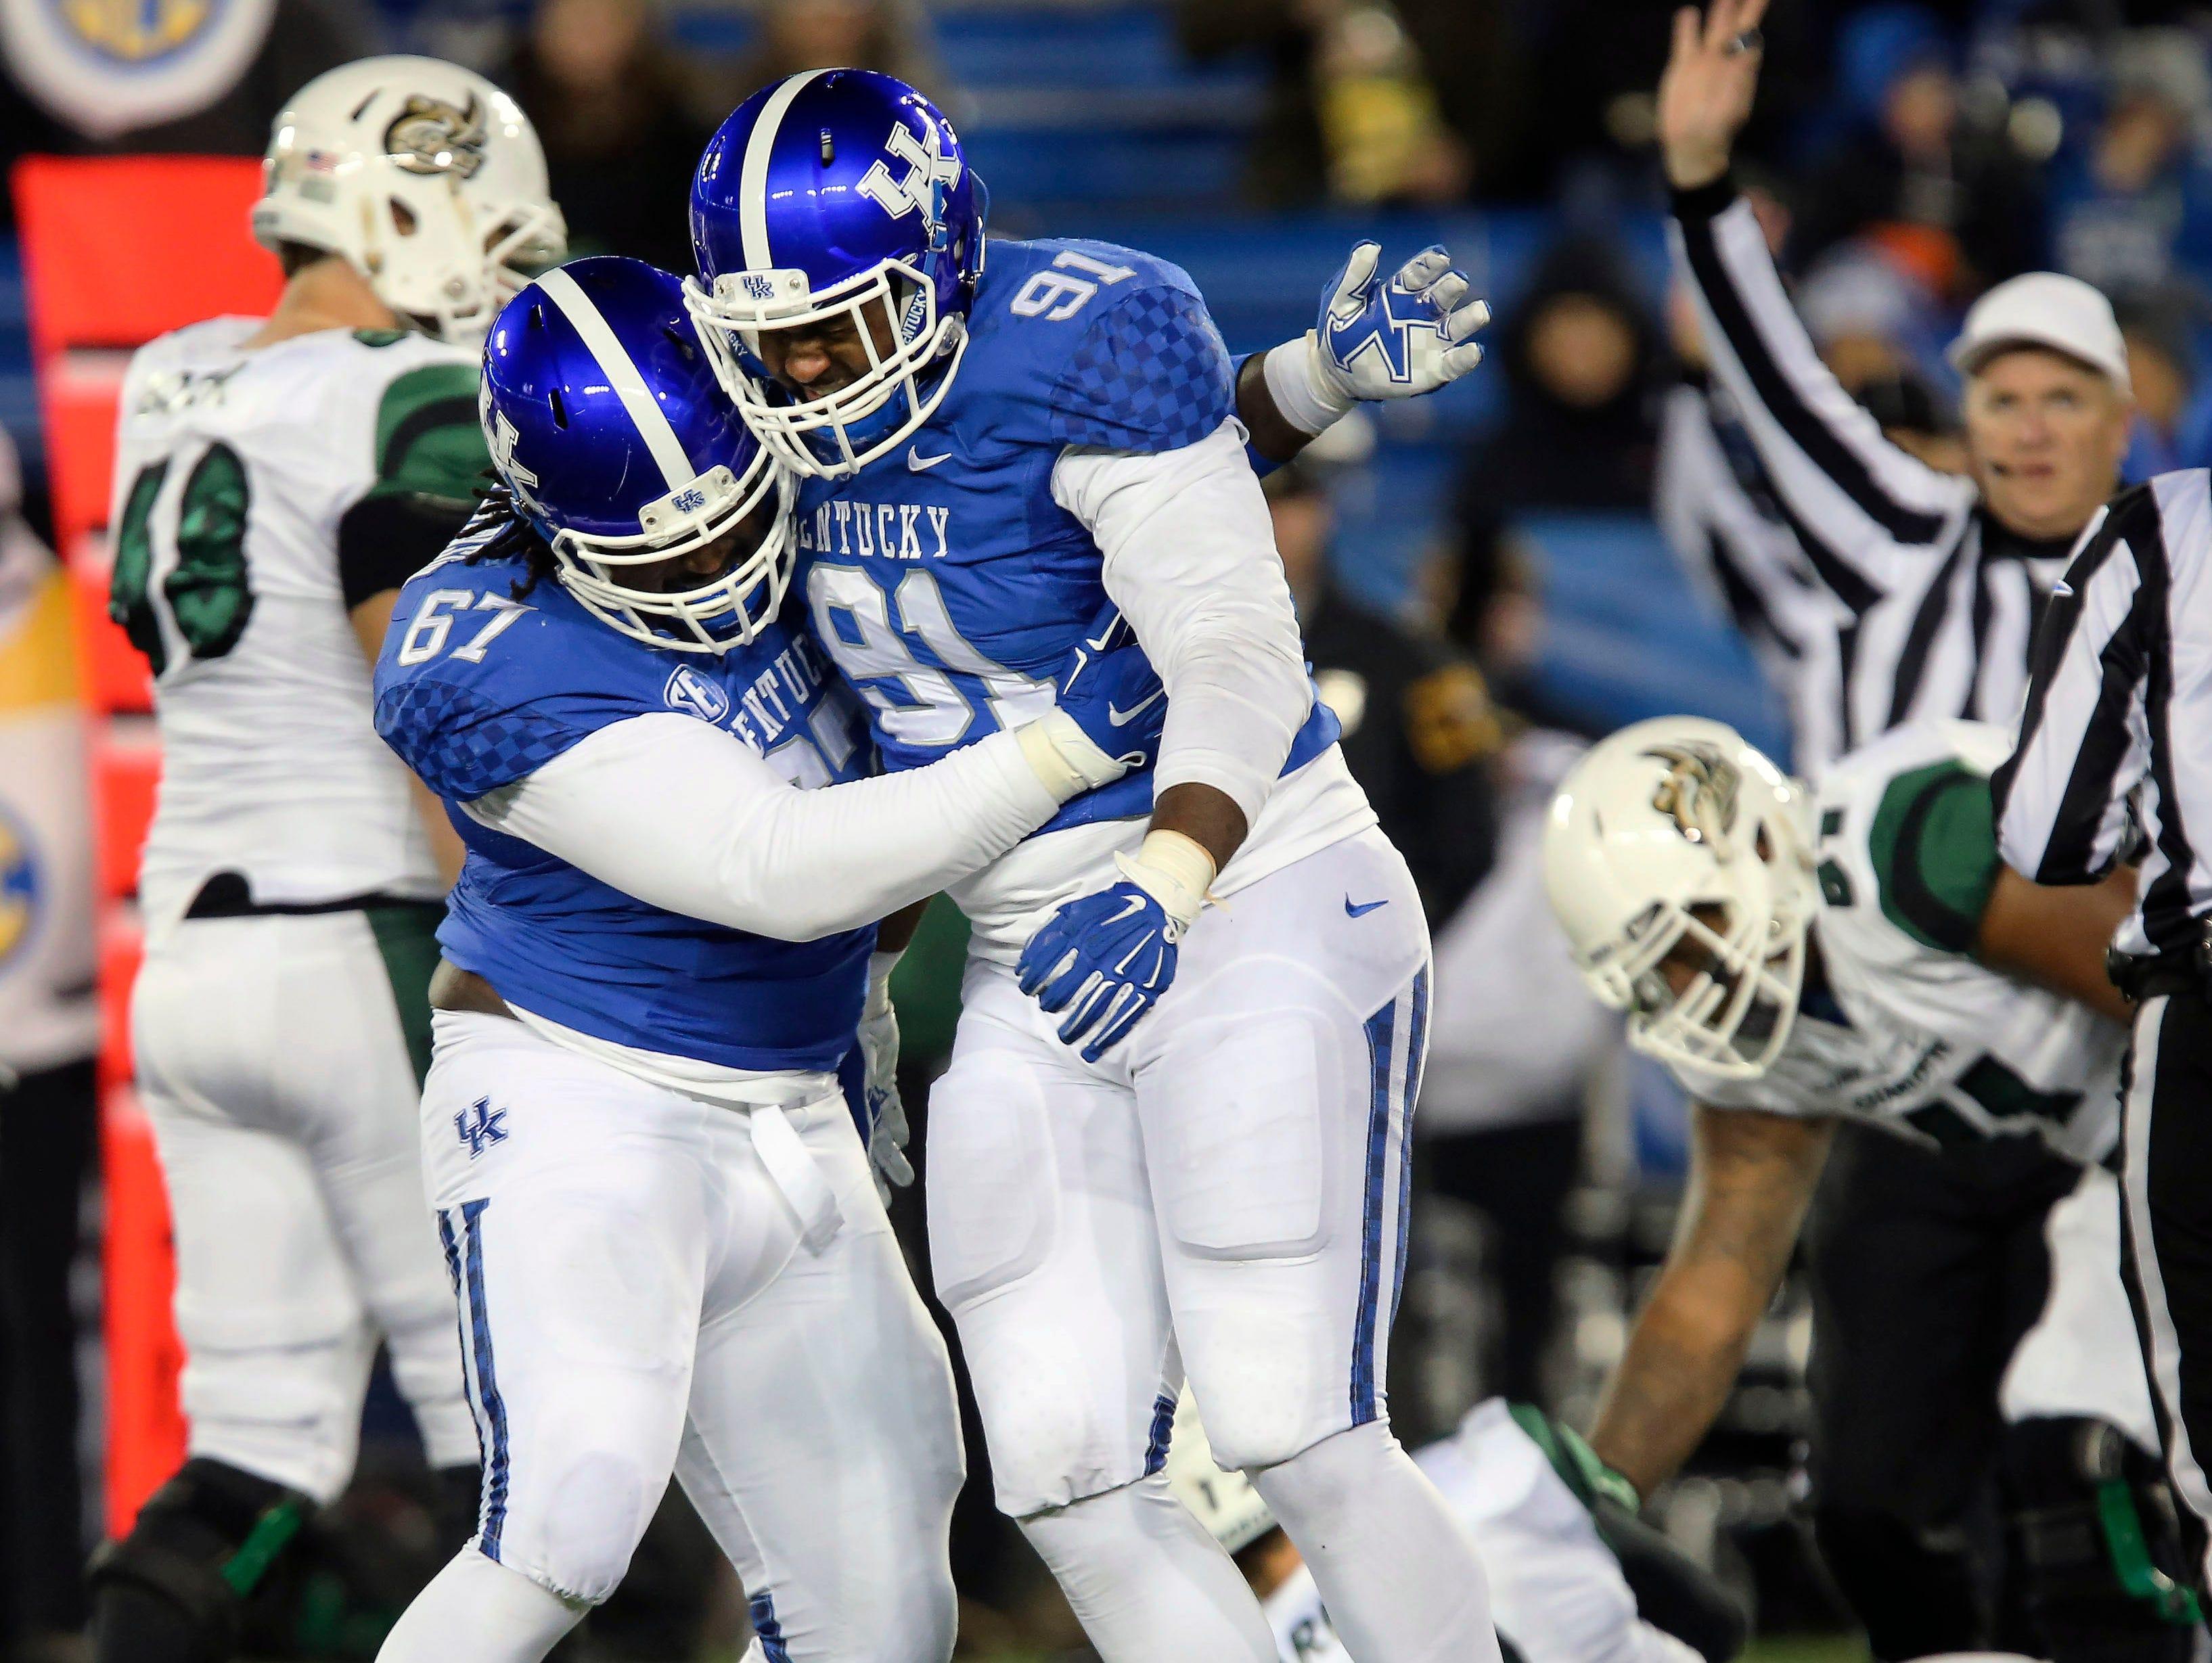 Kentucky defensive tackle Cory Johnson, left, congratulates defensive end Farrington Huguenin after he sacked Charlotte quarterback Brooks Barden during the first half of an NCAA college football game Saturday, Nov. 21, 2015, in Lexington, Ky.